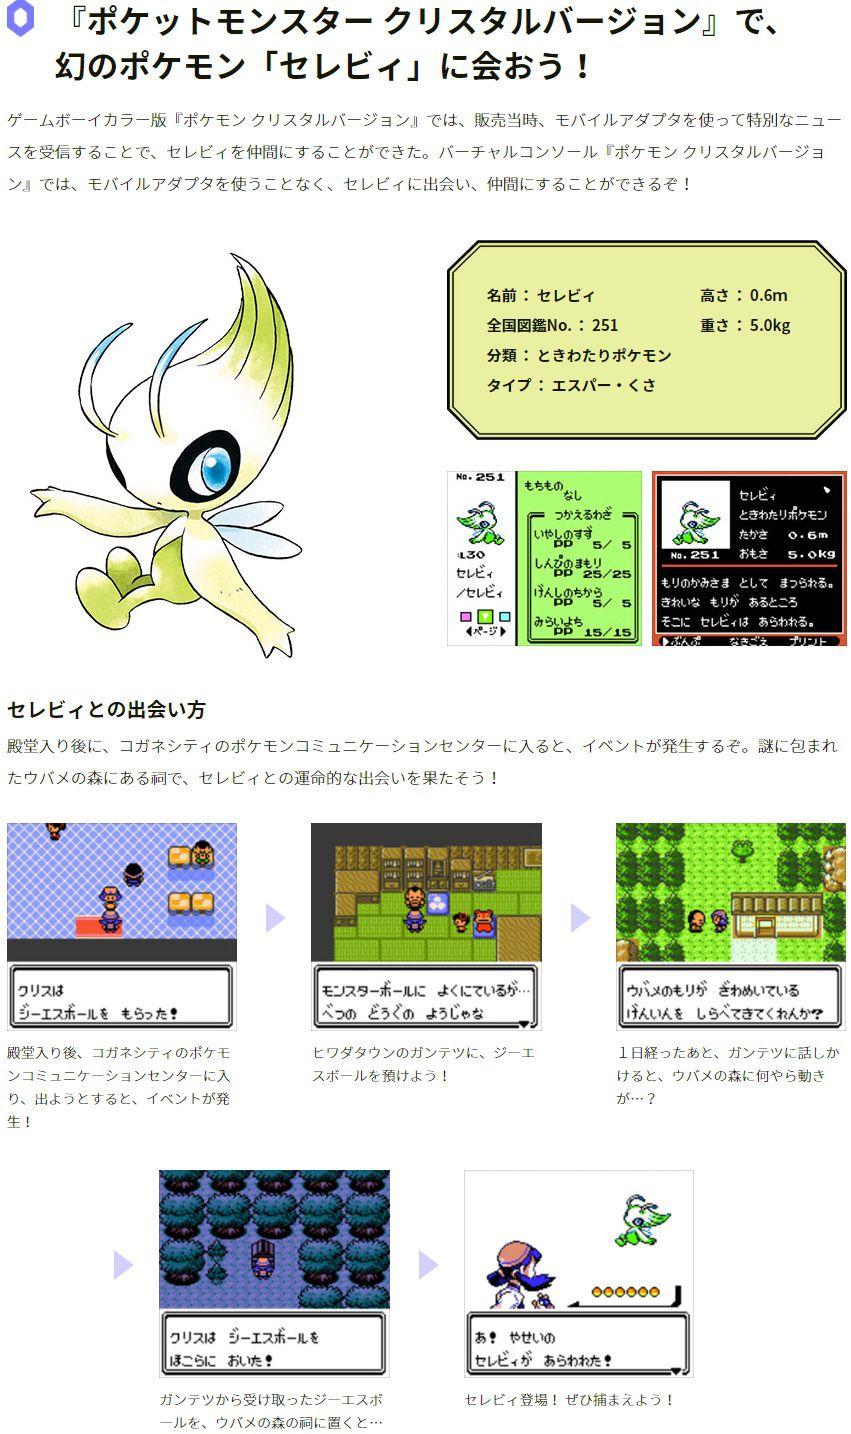 image_10893.jpg